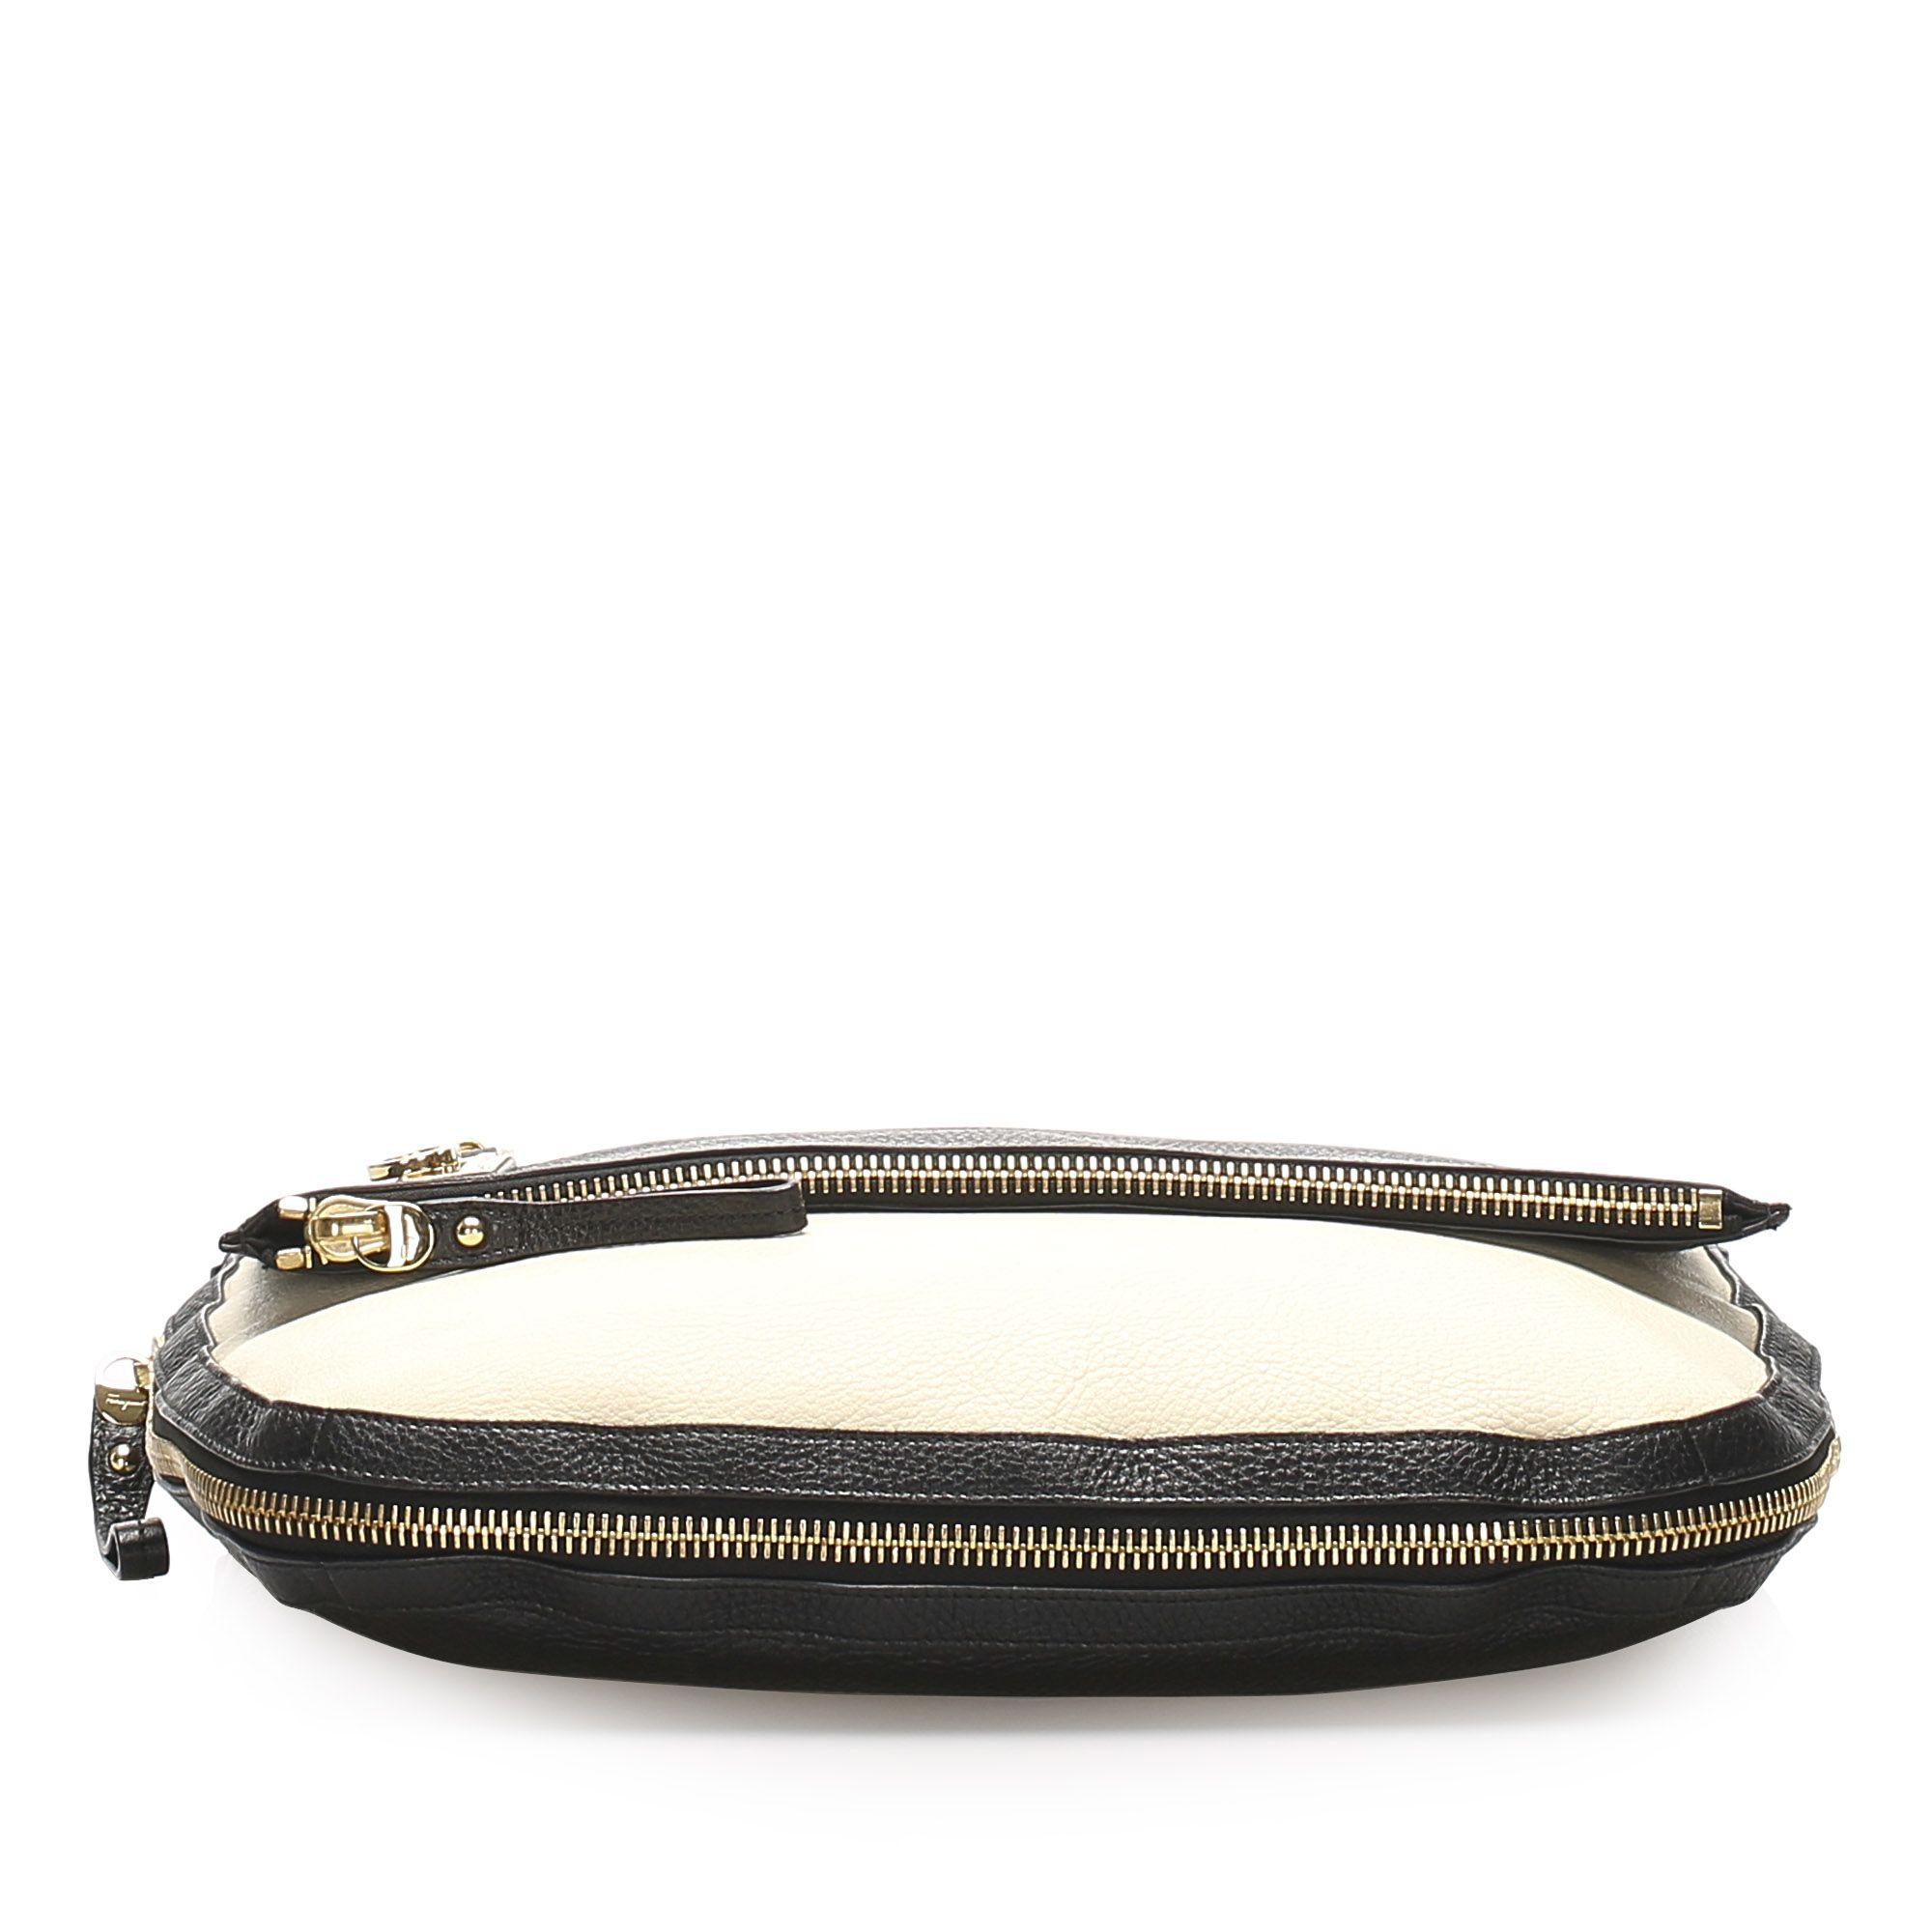 Vintage Ferragamo Leather Handbag Black